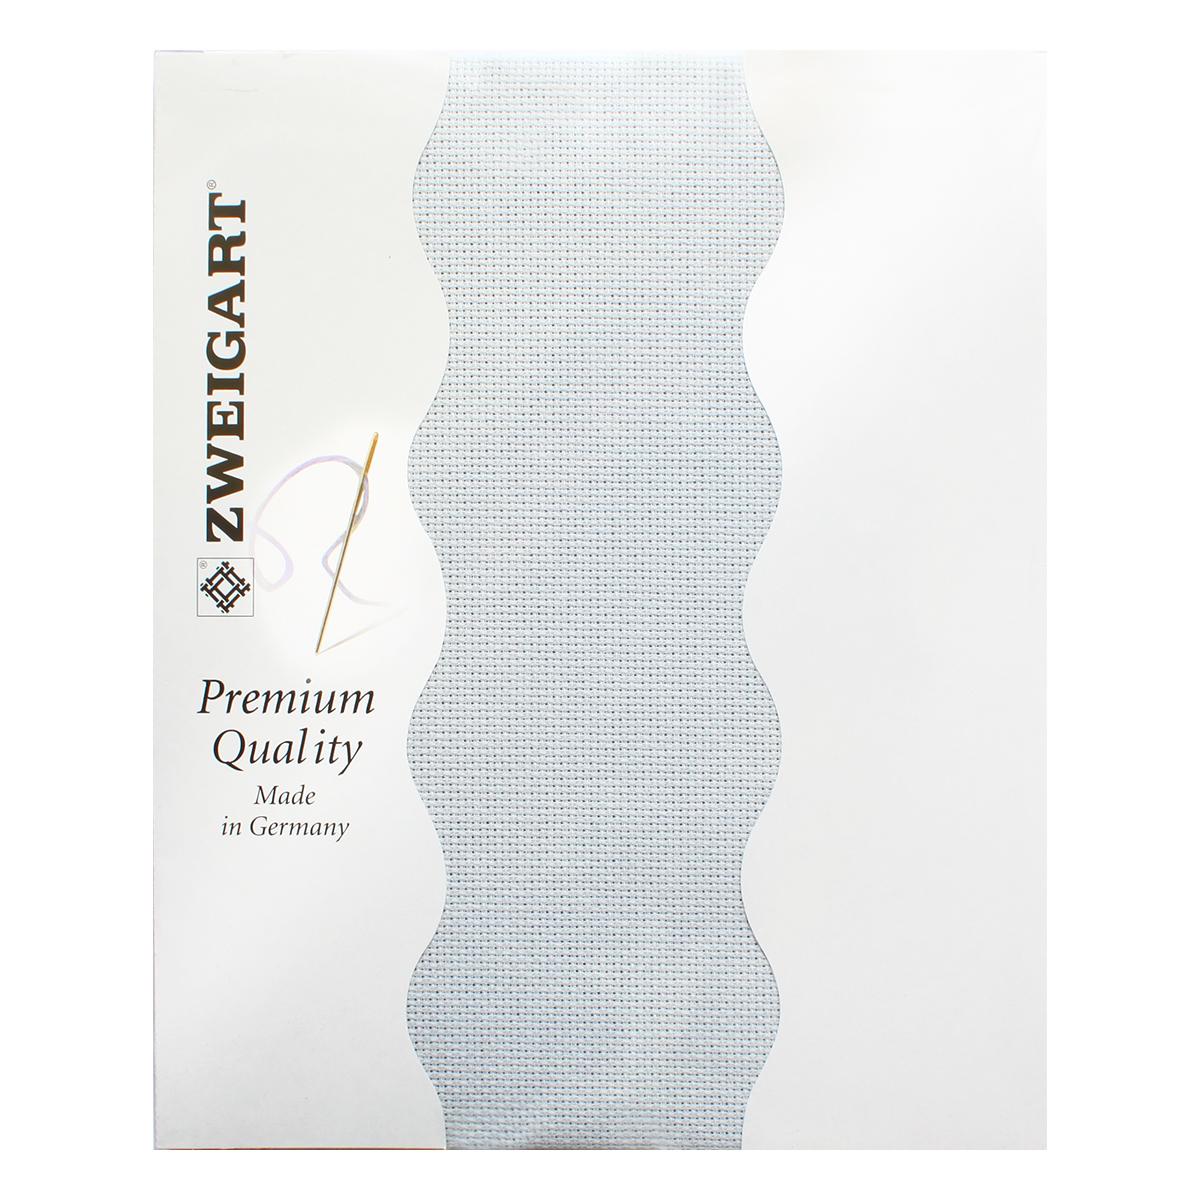 Канва для вышивания Zweigart Aida 16, цвет: светло-серый, 50 х 55 см. 3251/713 aida 16 594